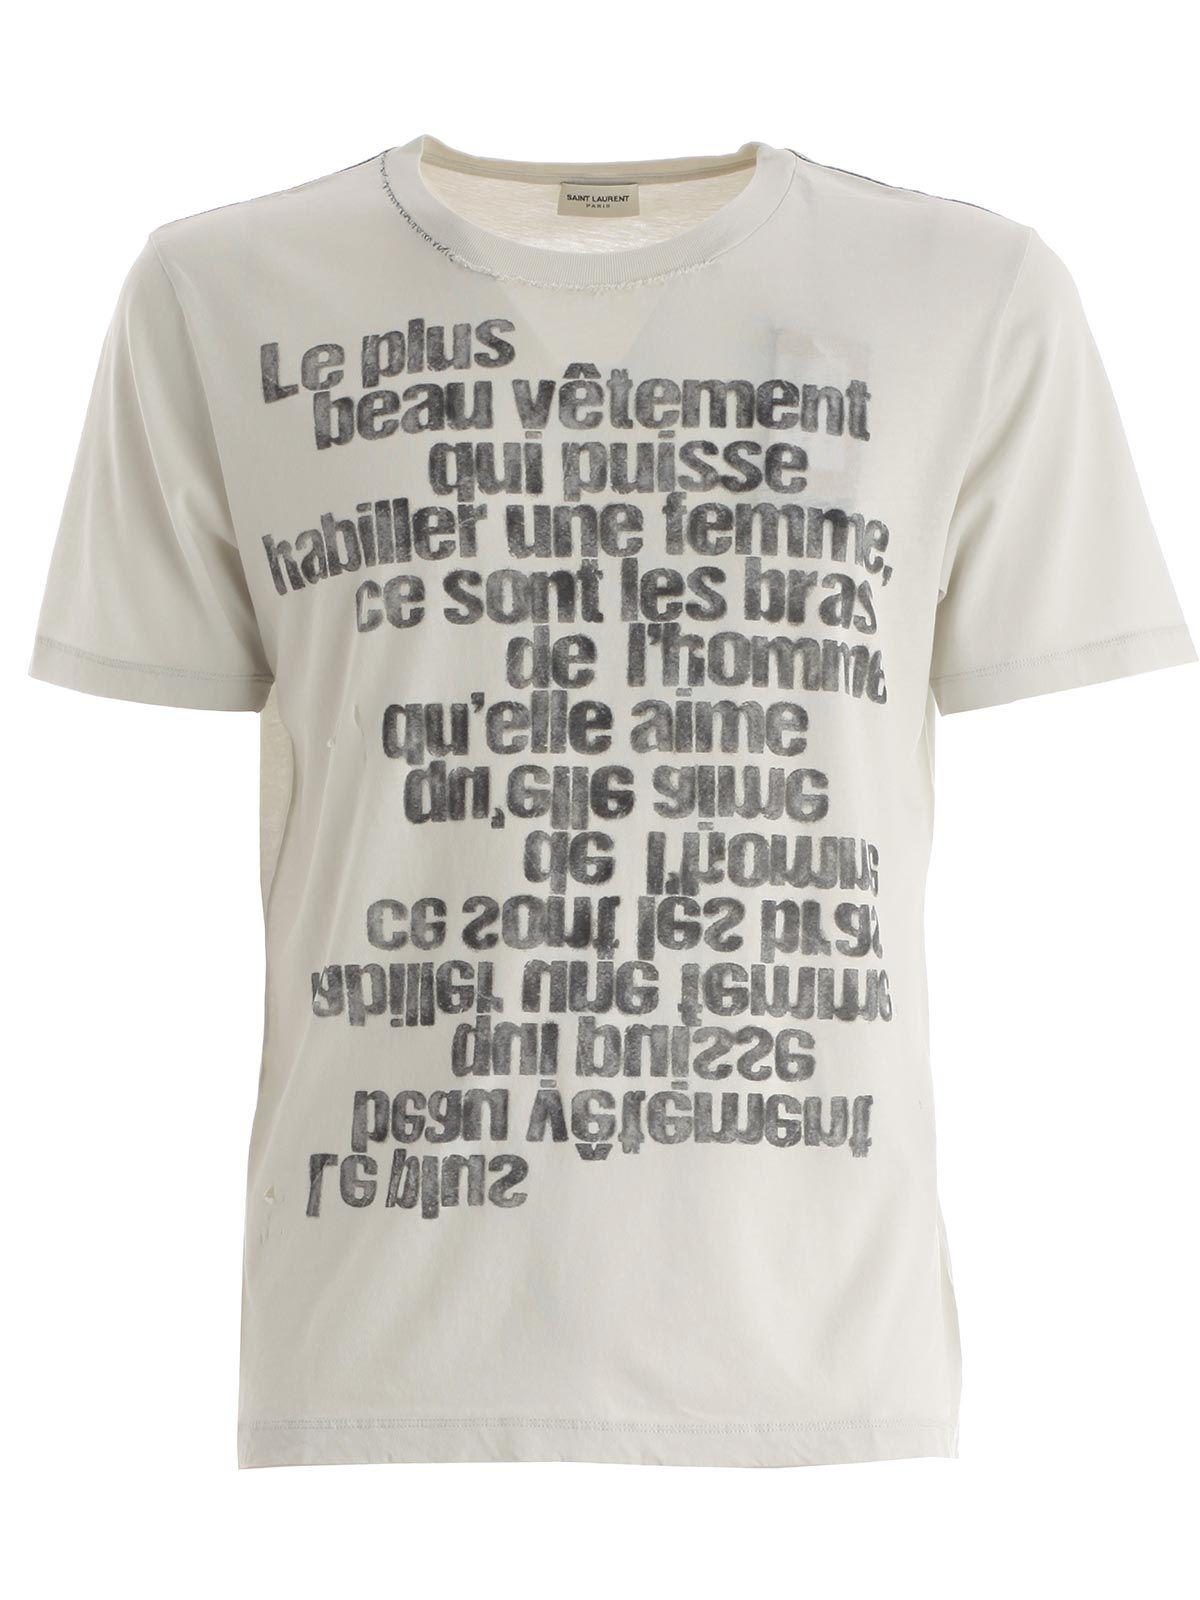 Saint Laurent Top